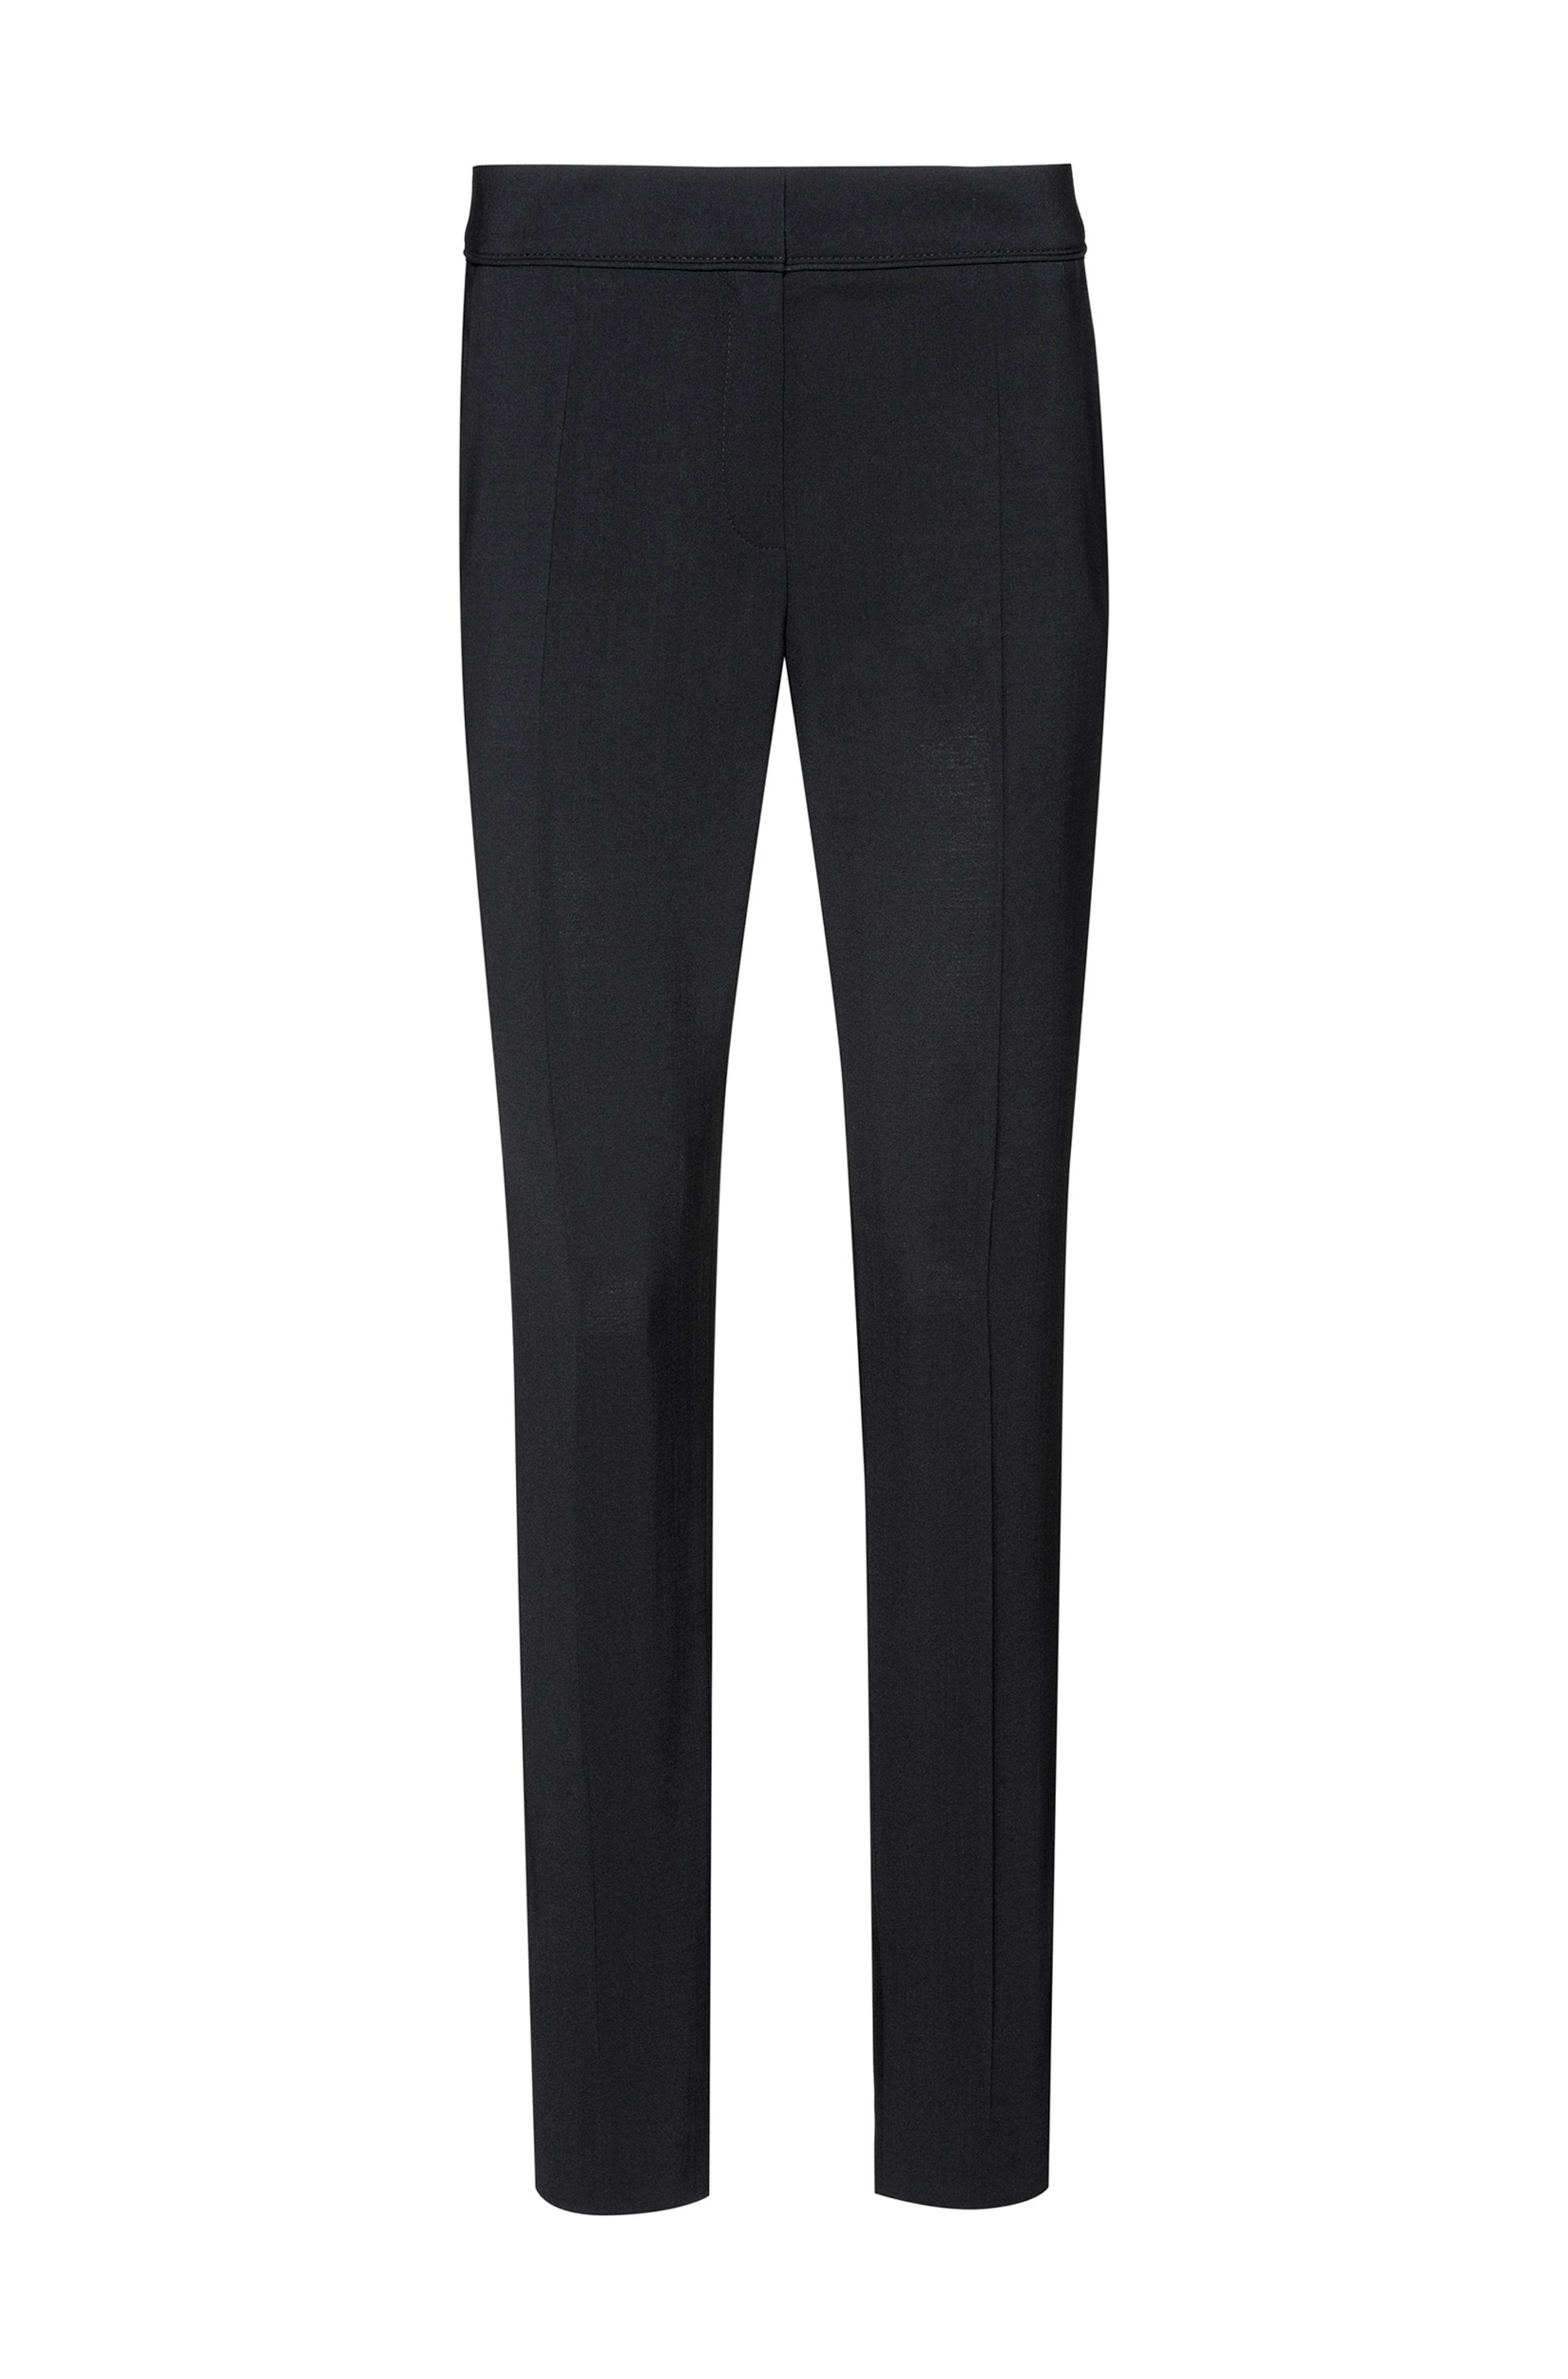 Regular-fit cropped trousers in stretch virgin wool, Black